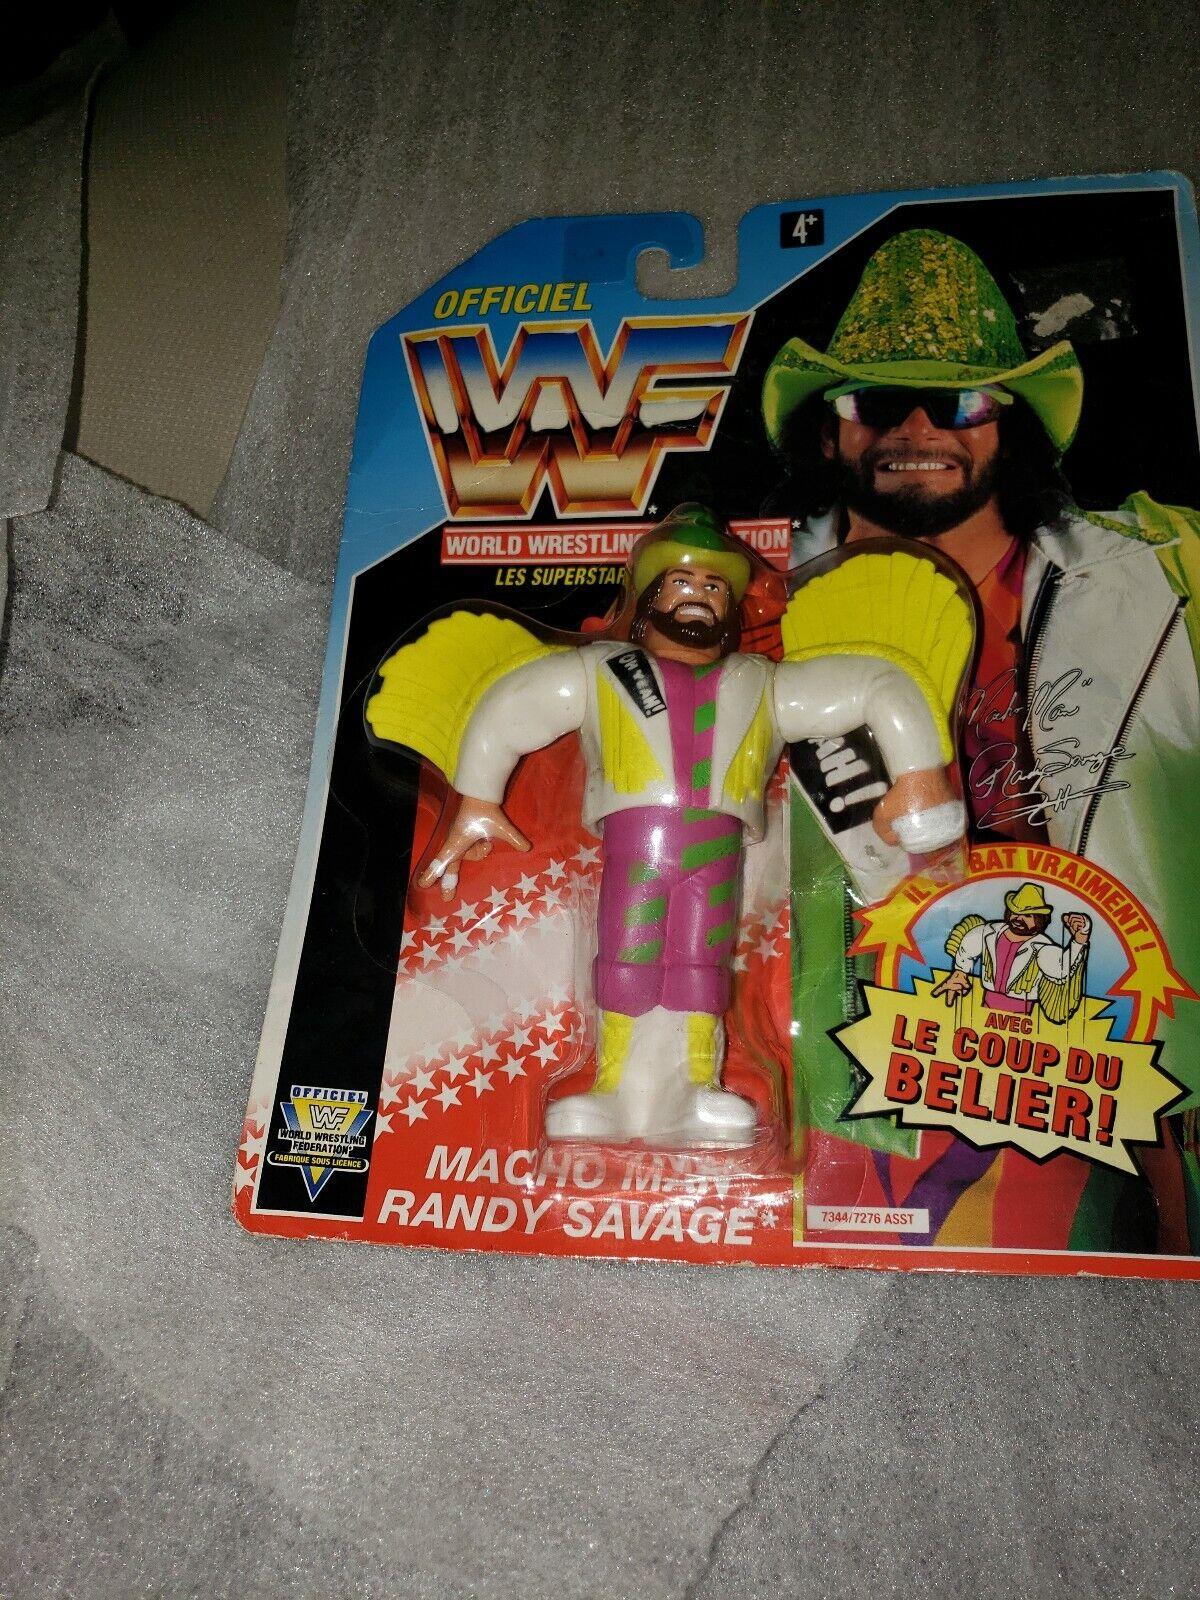 WWF Hasbro Macho uomo Rey Savage 1993 SERIE 5 Wrestling cifra Straniere autoD